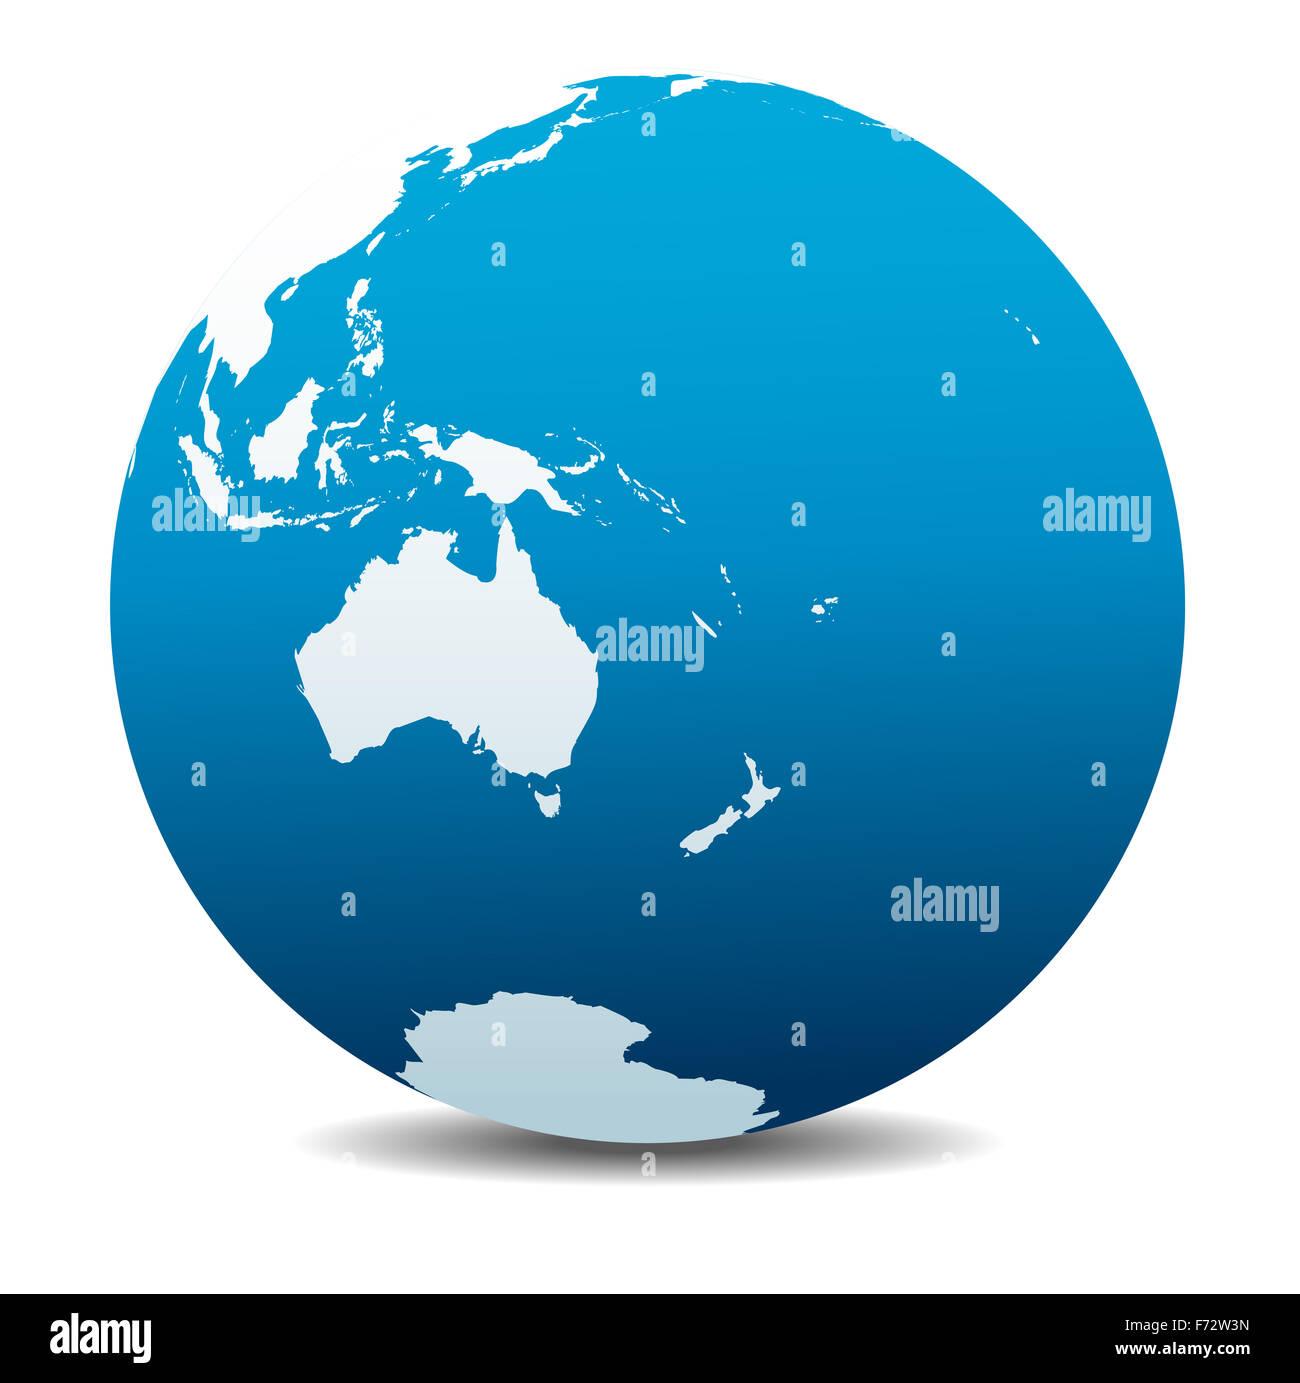 Australia and New Zealand, Global World - Stock Image